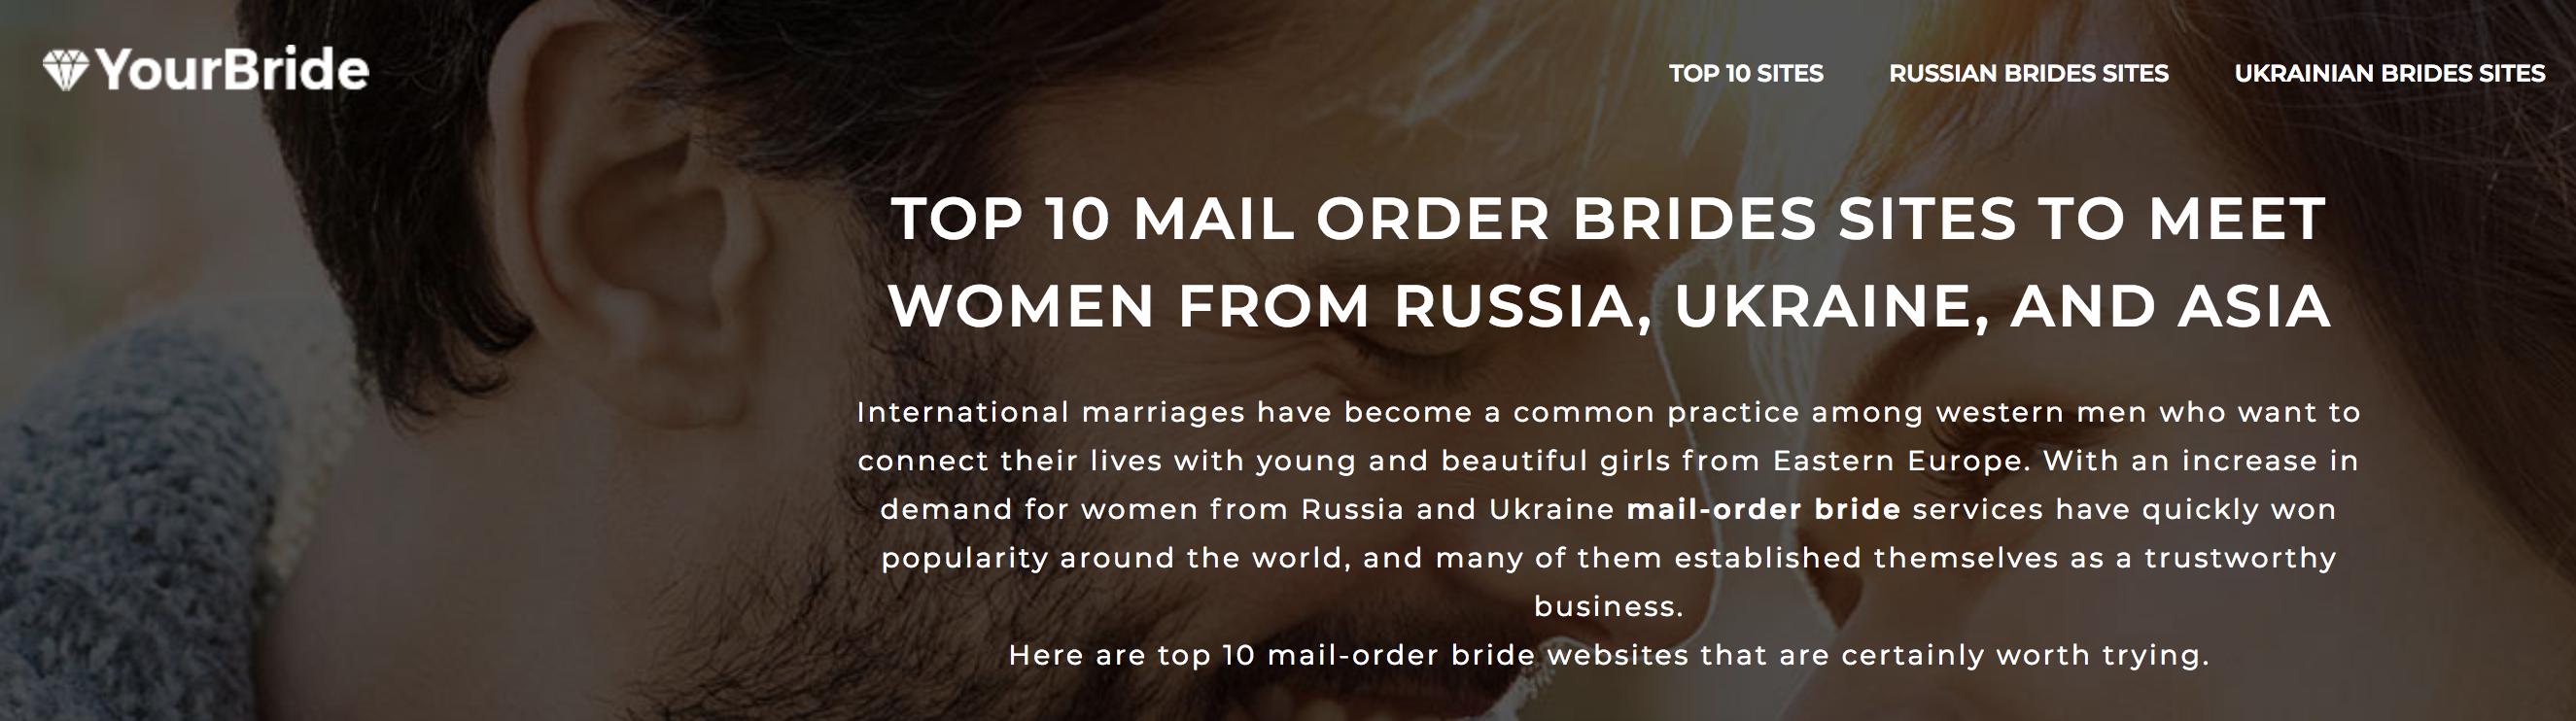 Top mail order brides